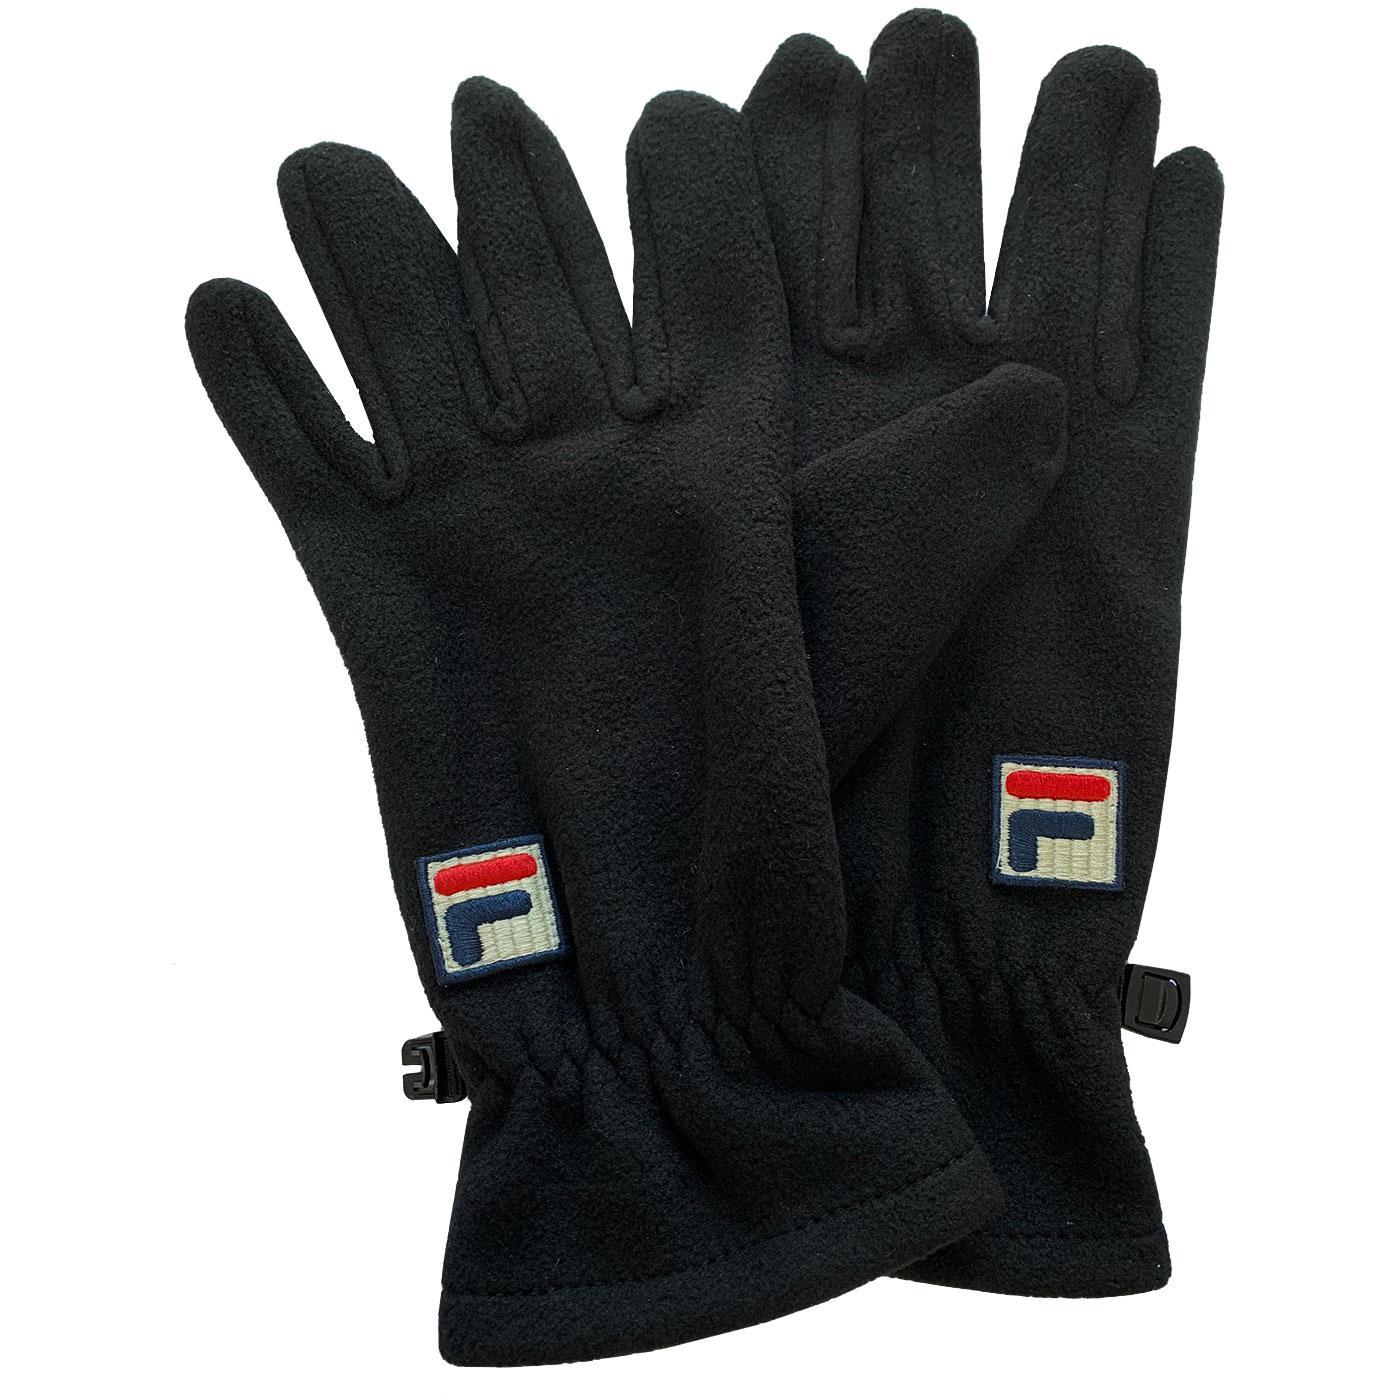 Coney FILA VINTAGE Retro Woven Fleece Gloves